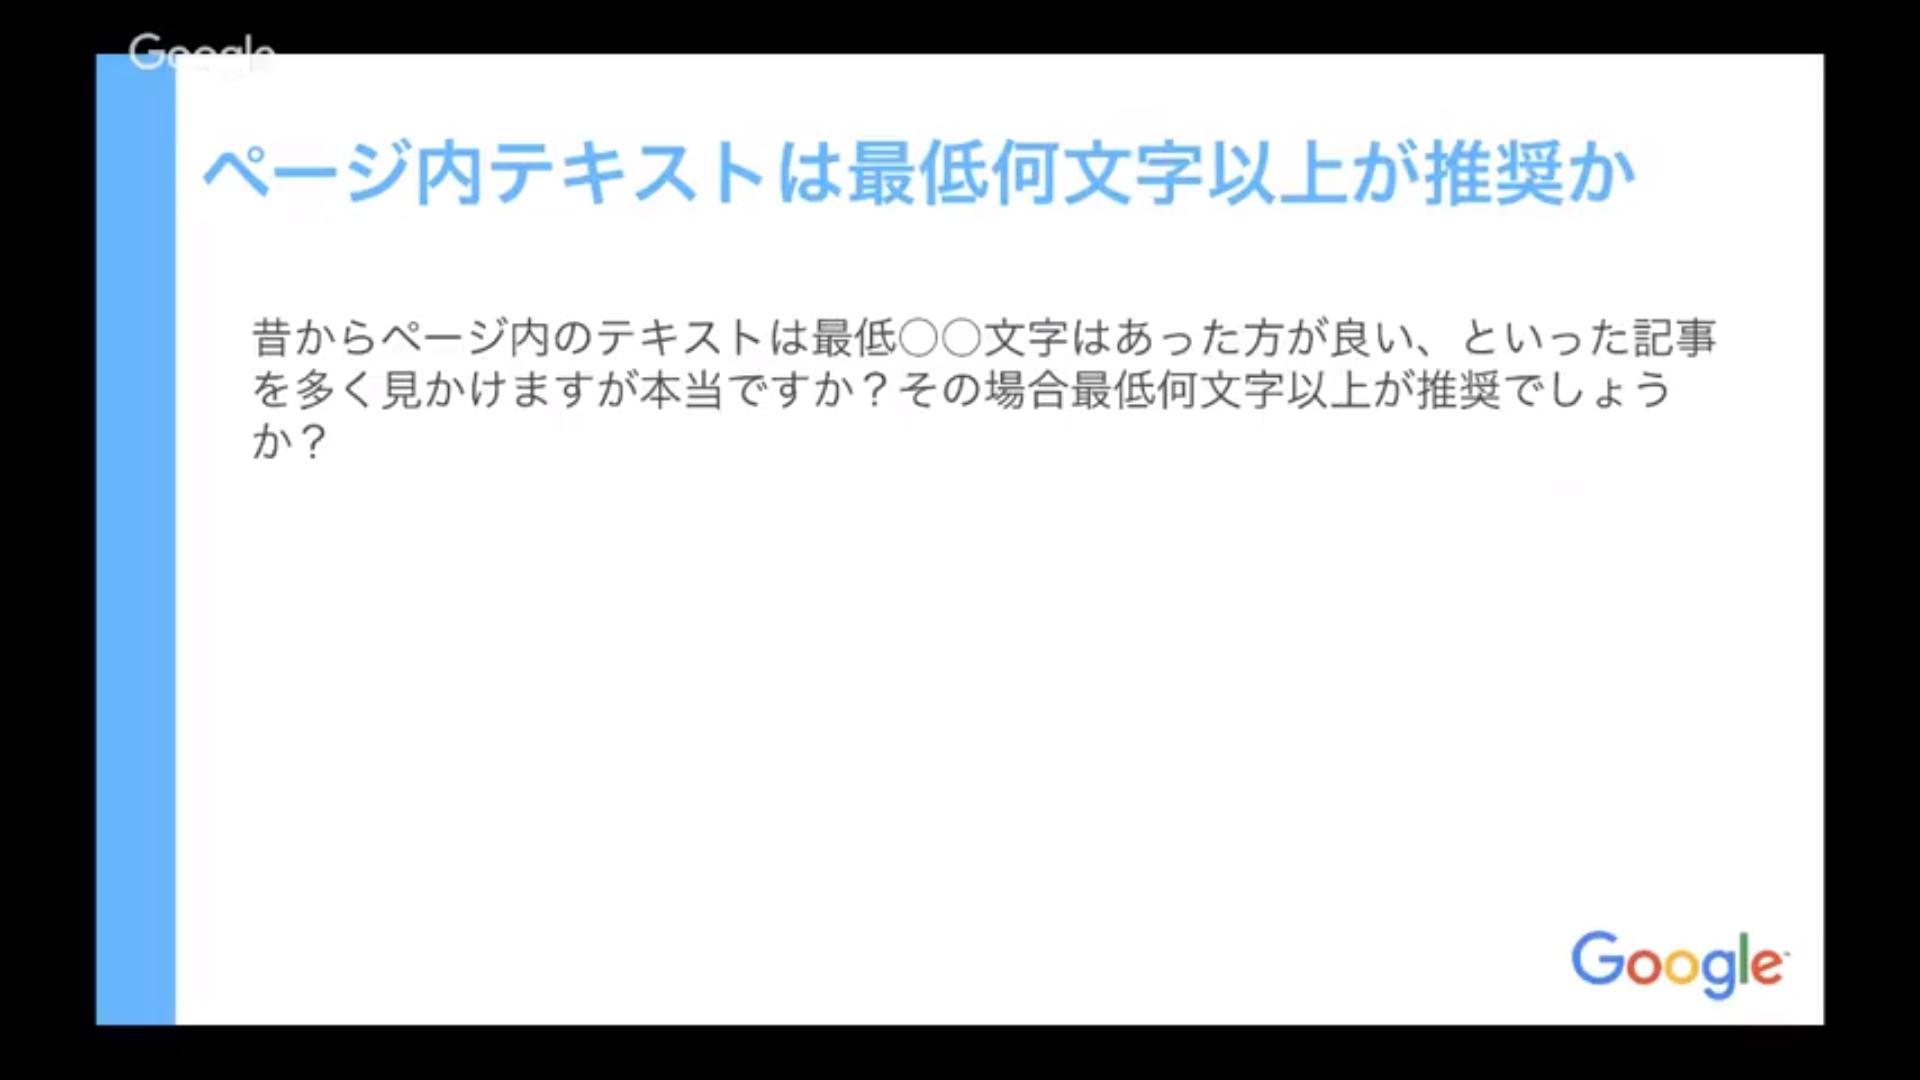 SnapCrab_NoName_2019-3-7_12-18-42_No-00